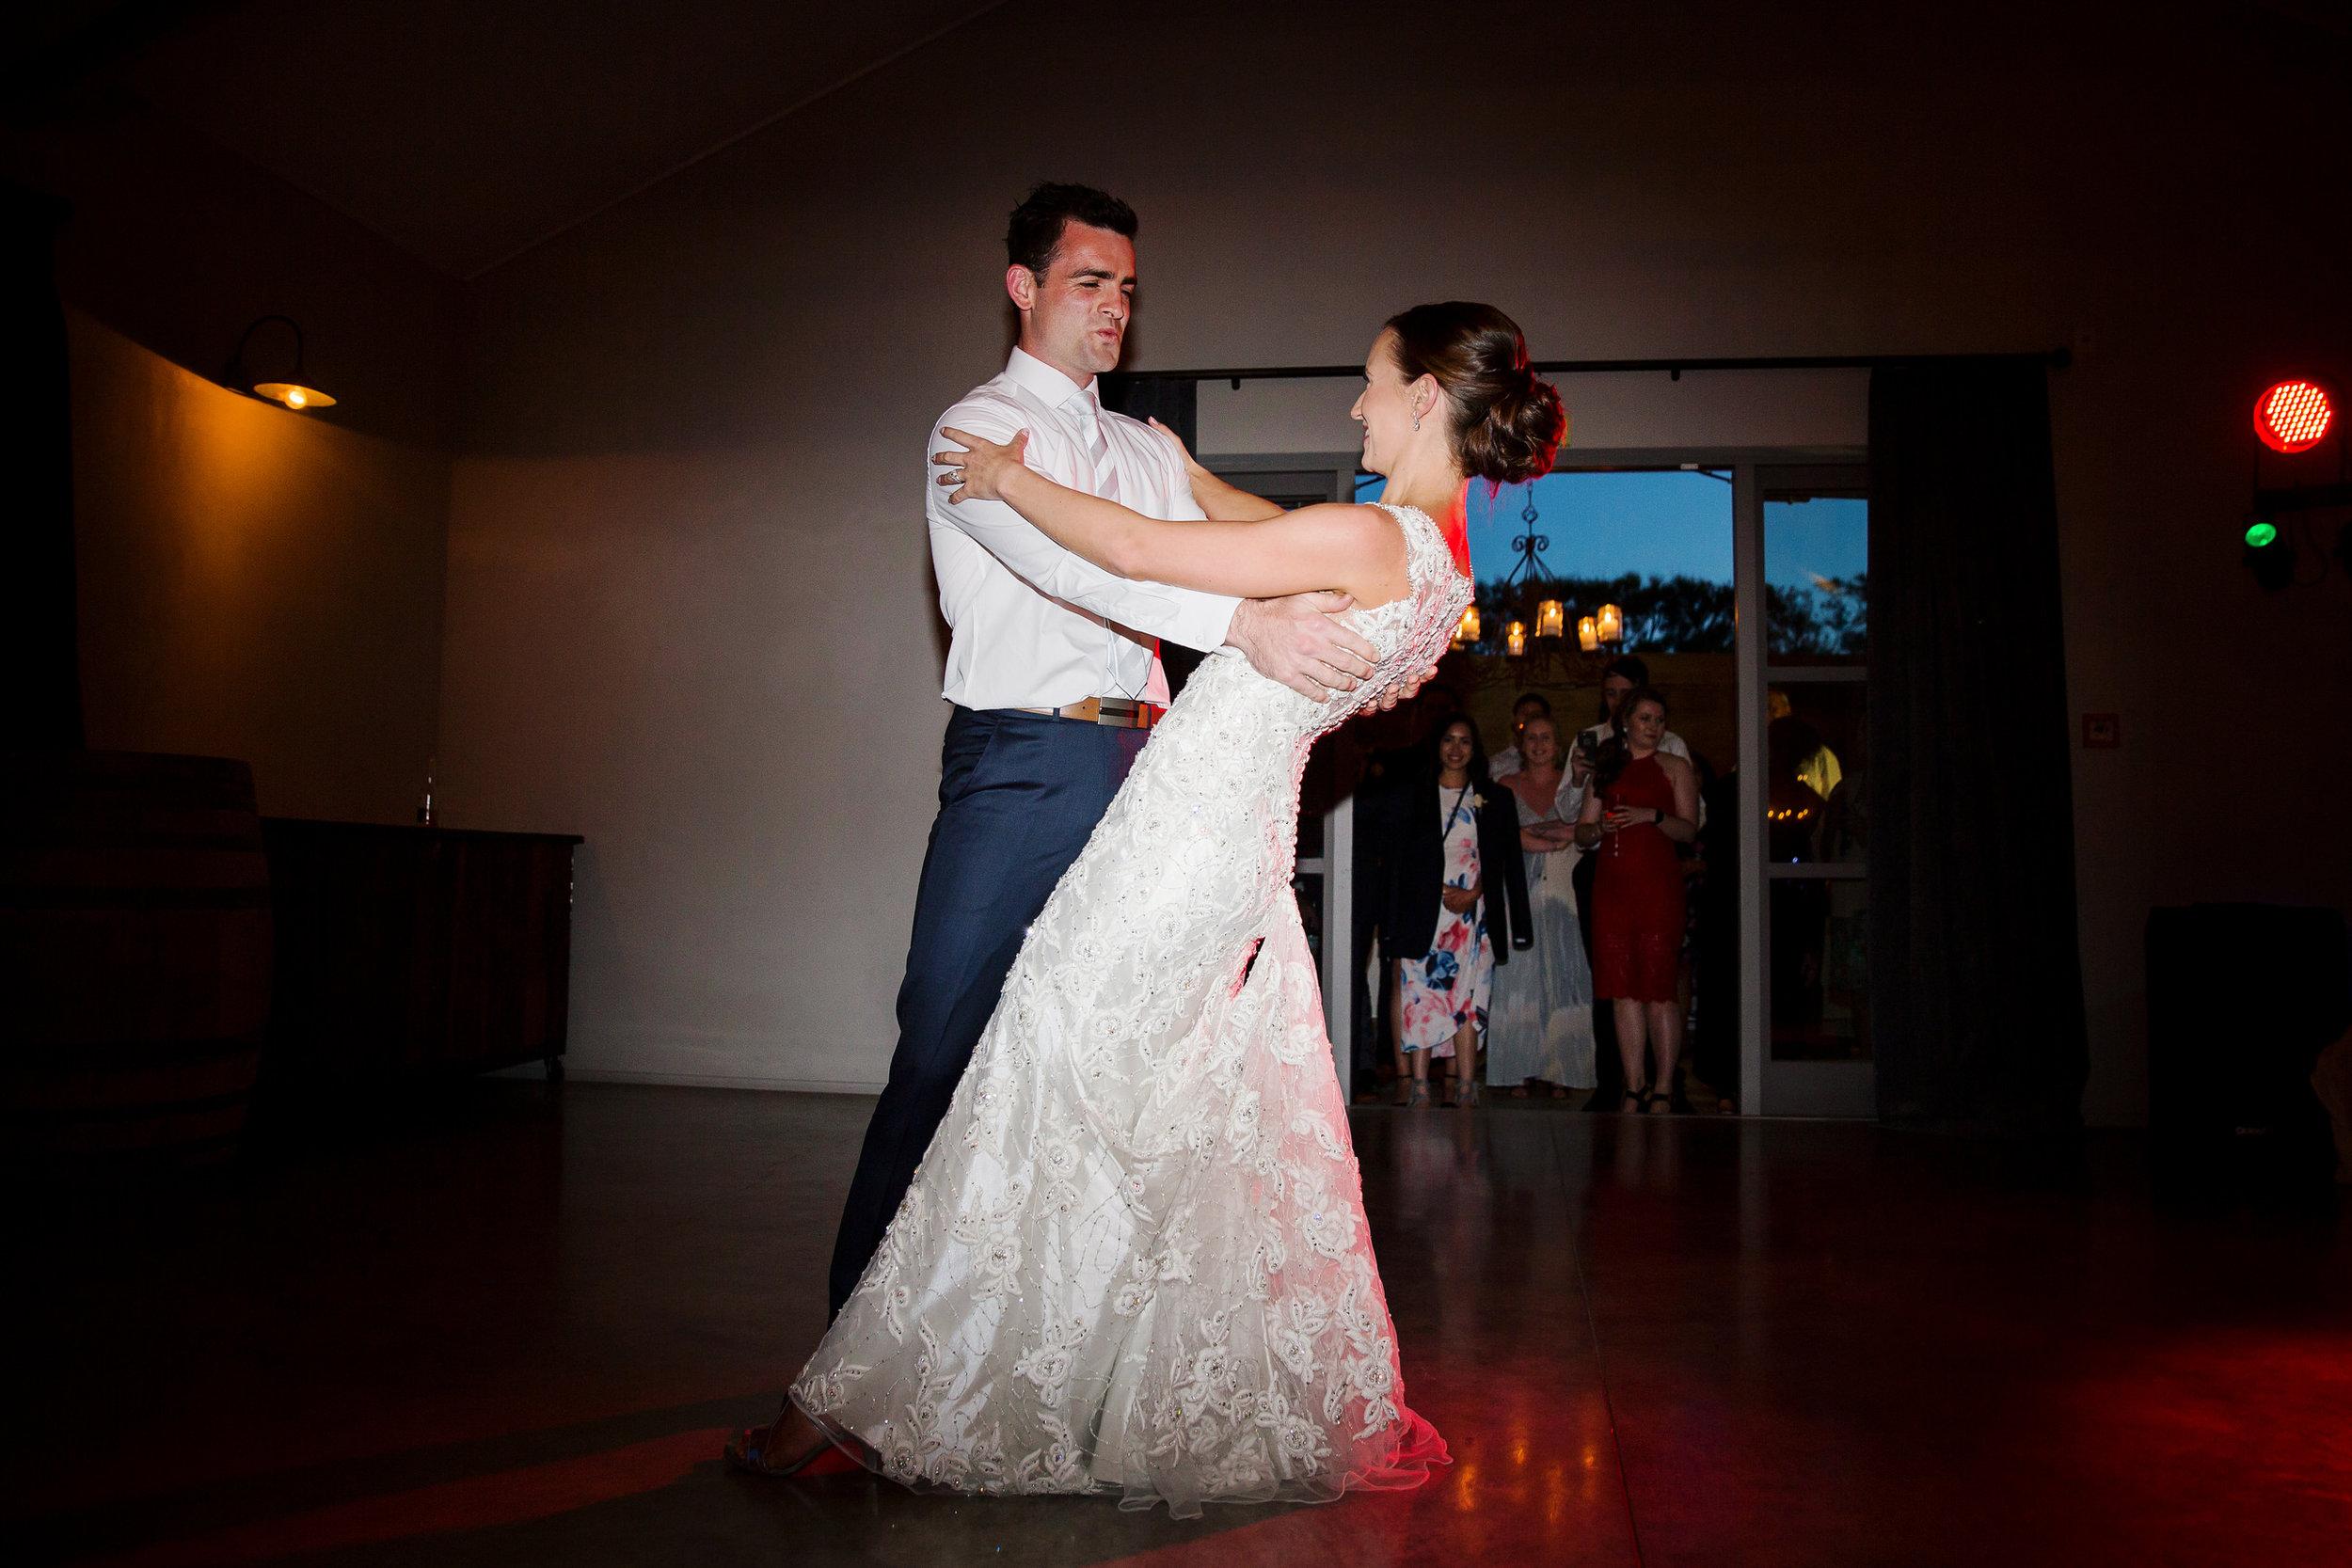 Martinborough-Poppies-Wedding-Caine-Eloise-Toni-Larsen-0160.jpg